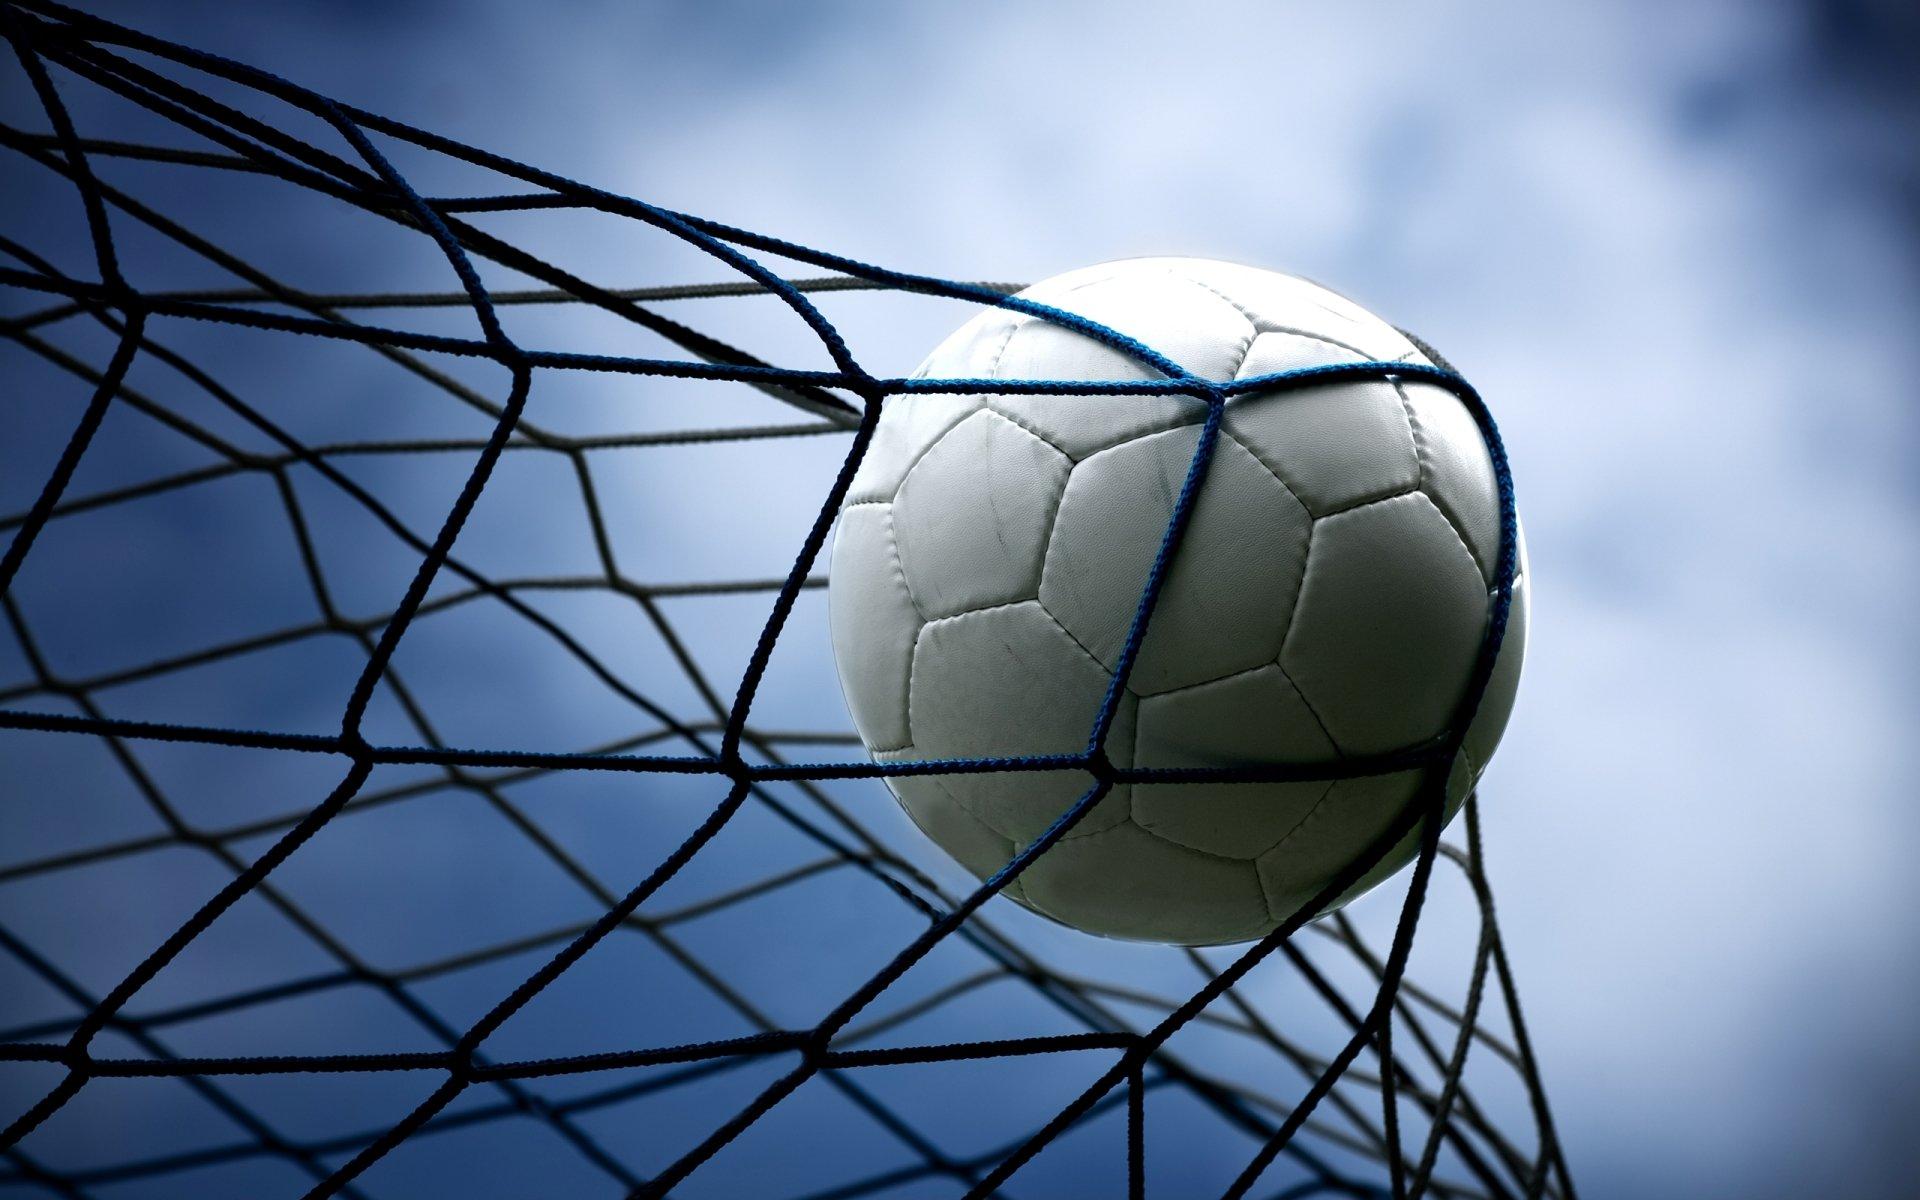 Fussball Predictions